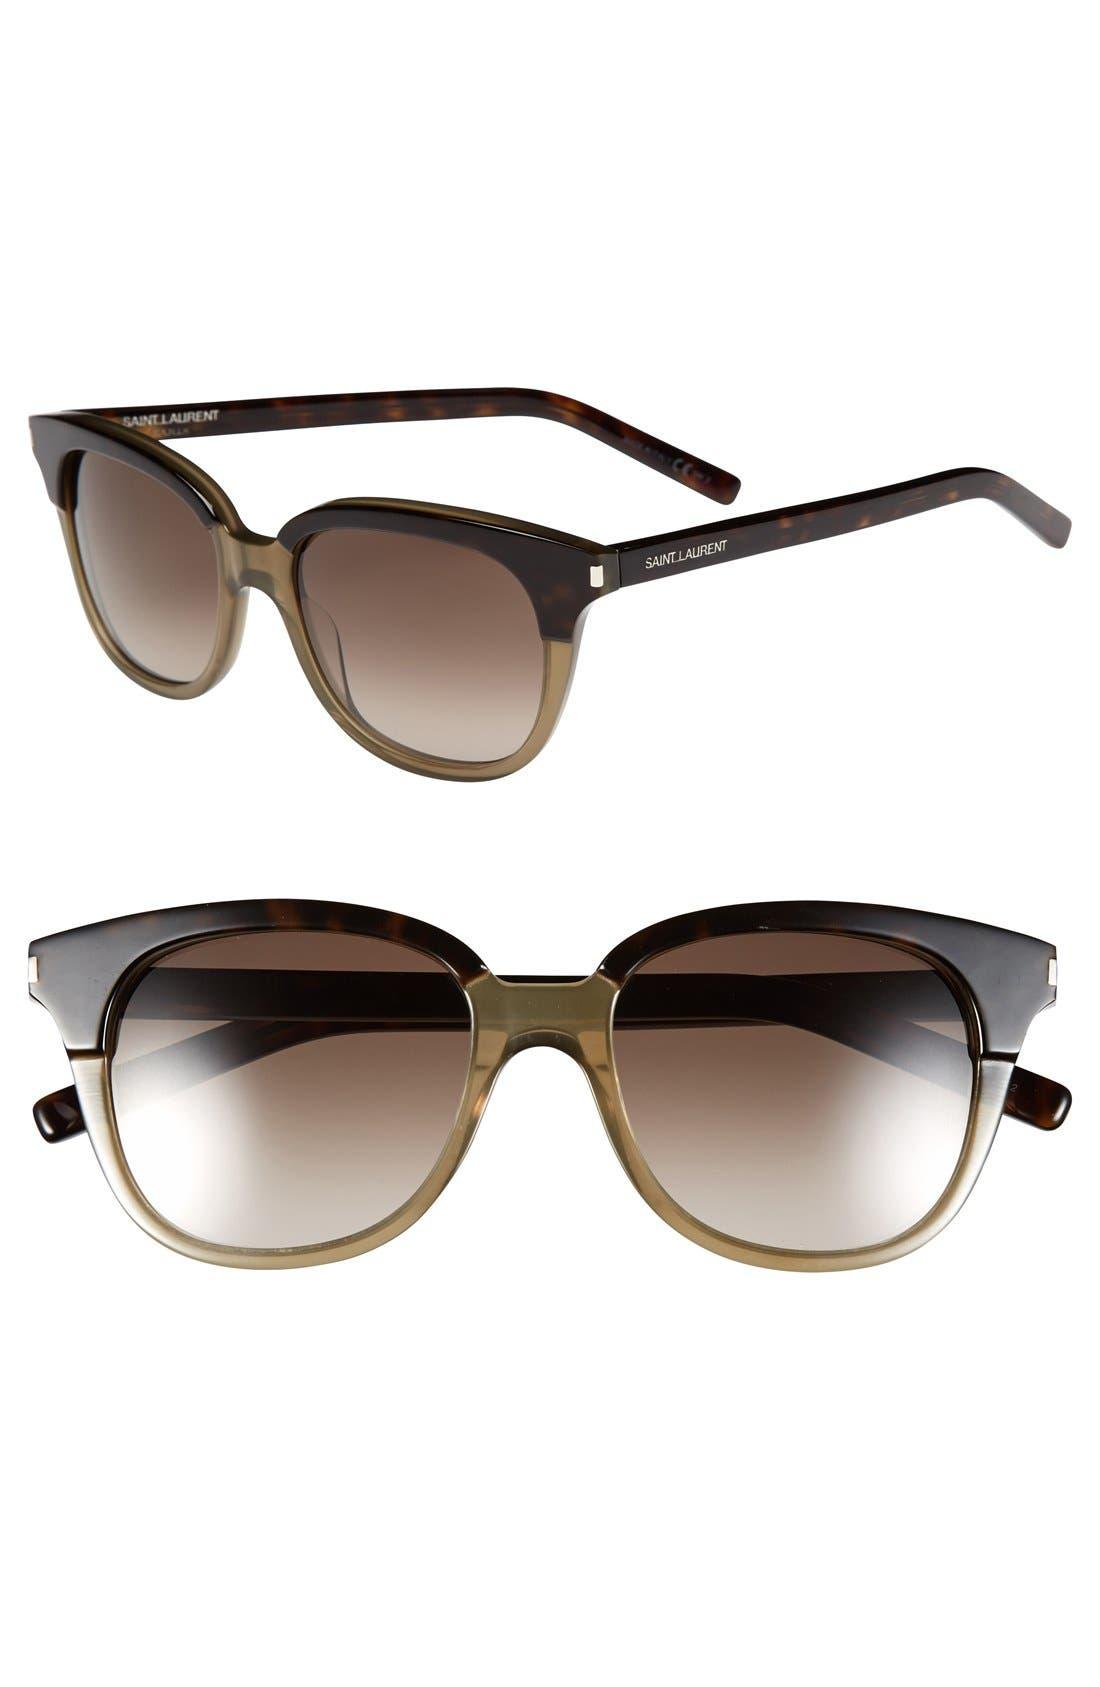 Alternate Image 1 Selected - Saint Laurent 51mm Retro Sunglasses